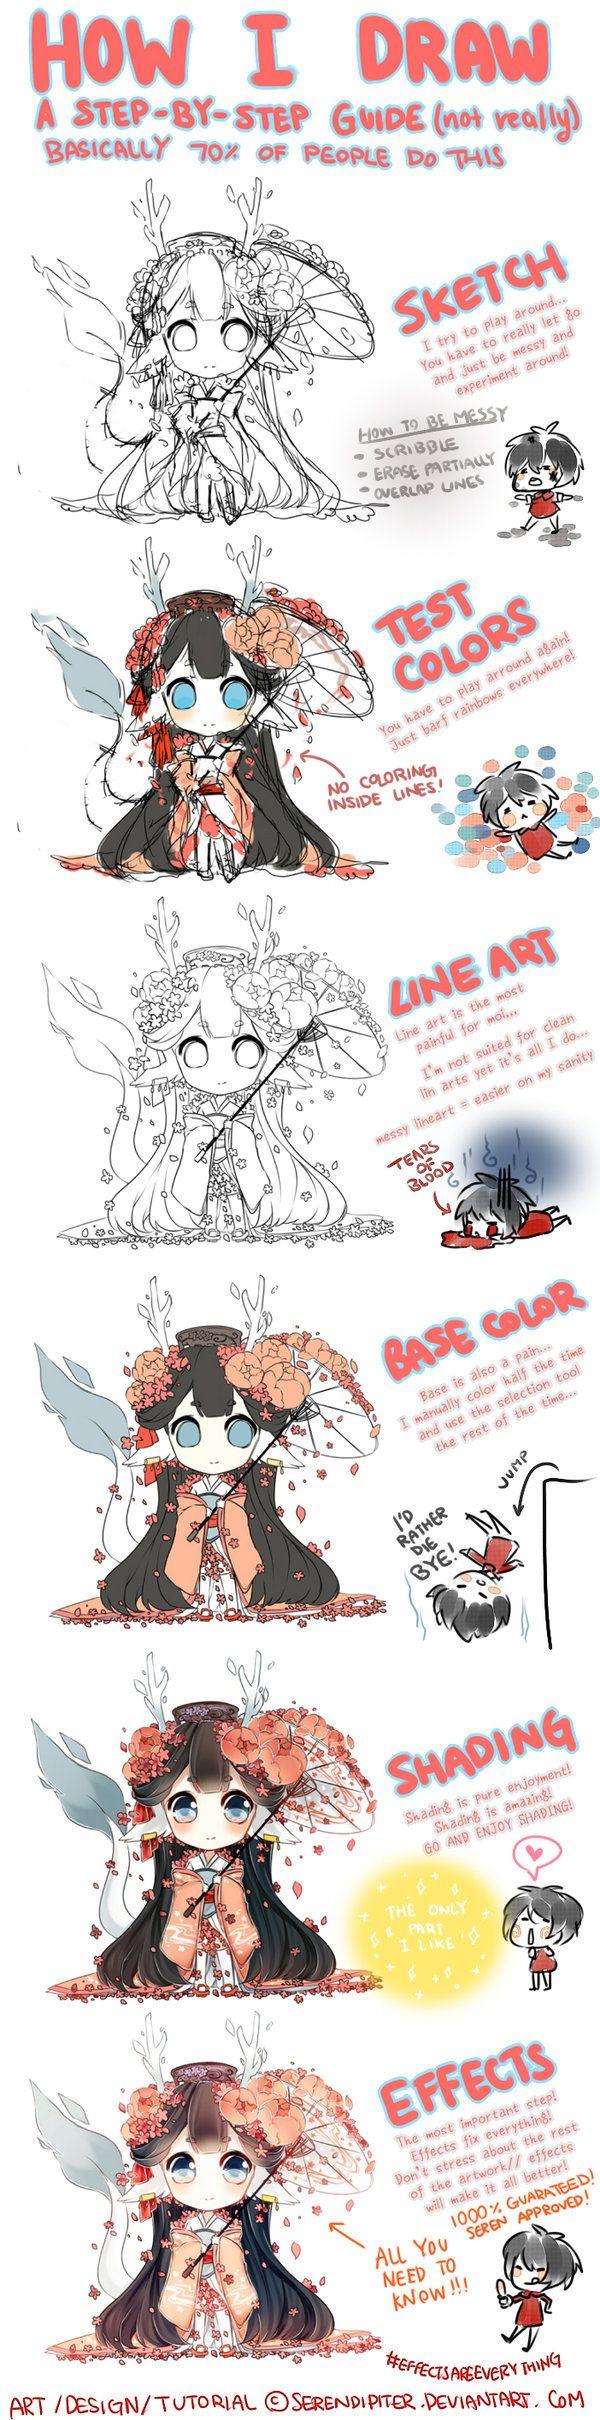 How I draw by Staccatos.deviantart.com on @DeviantArt